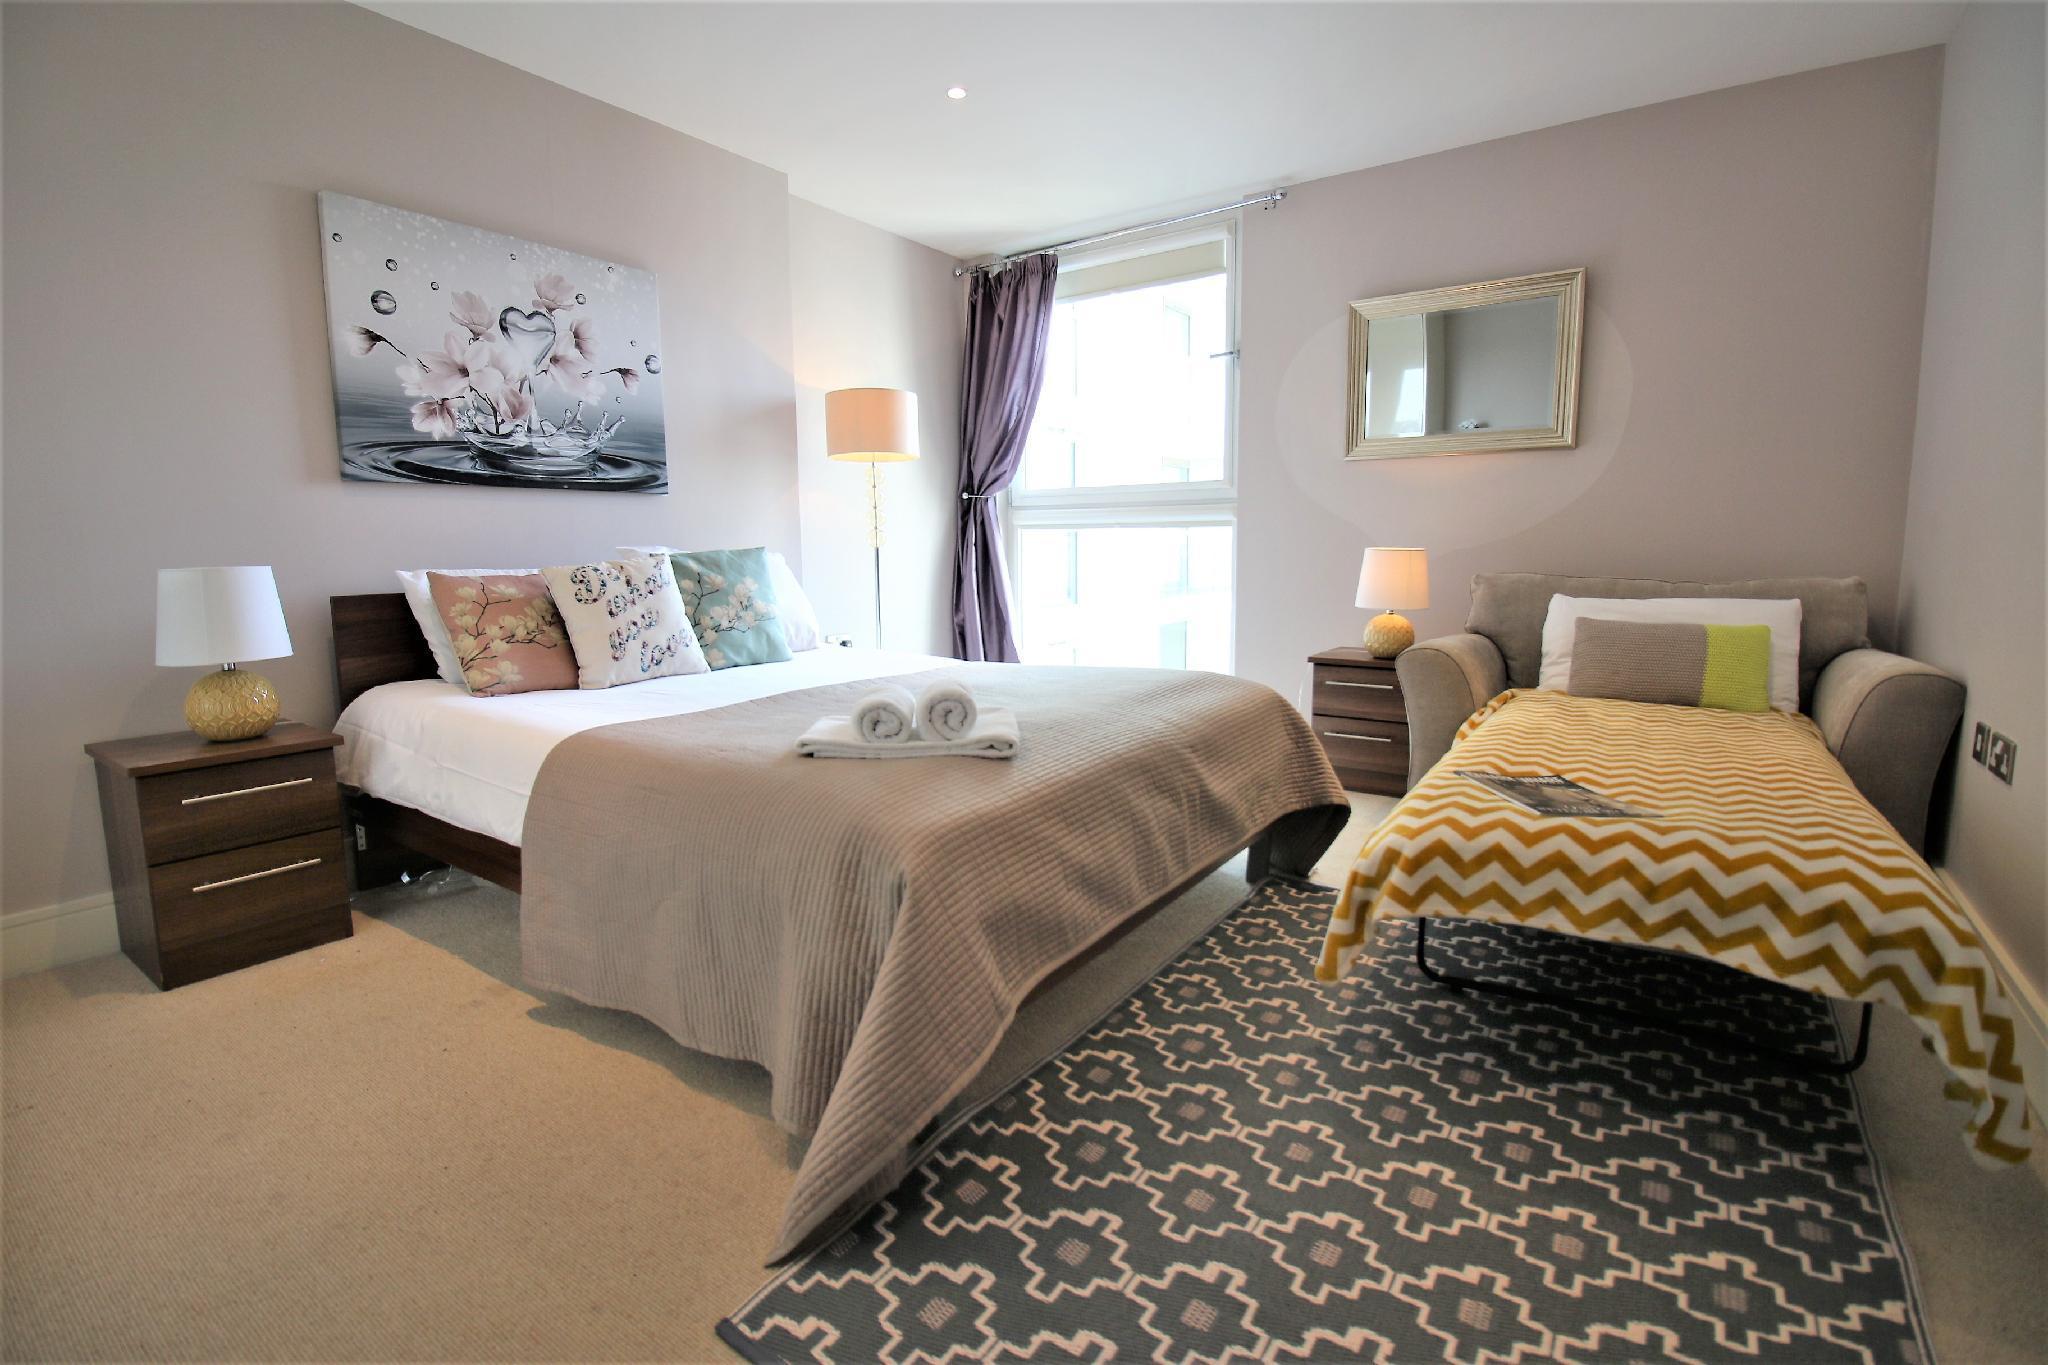 Extravagant Court apartment, Docklands